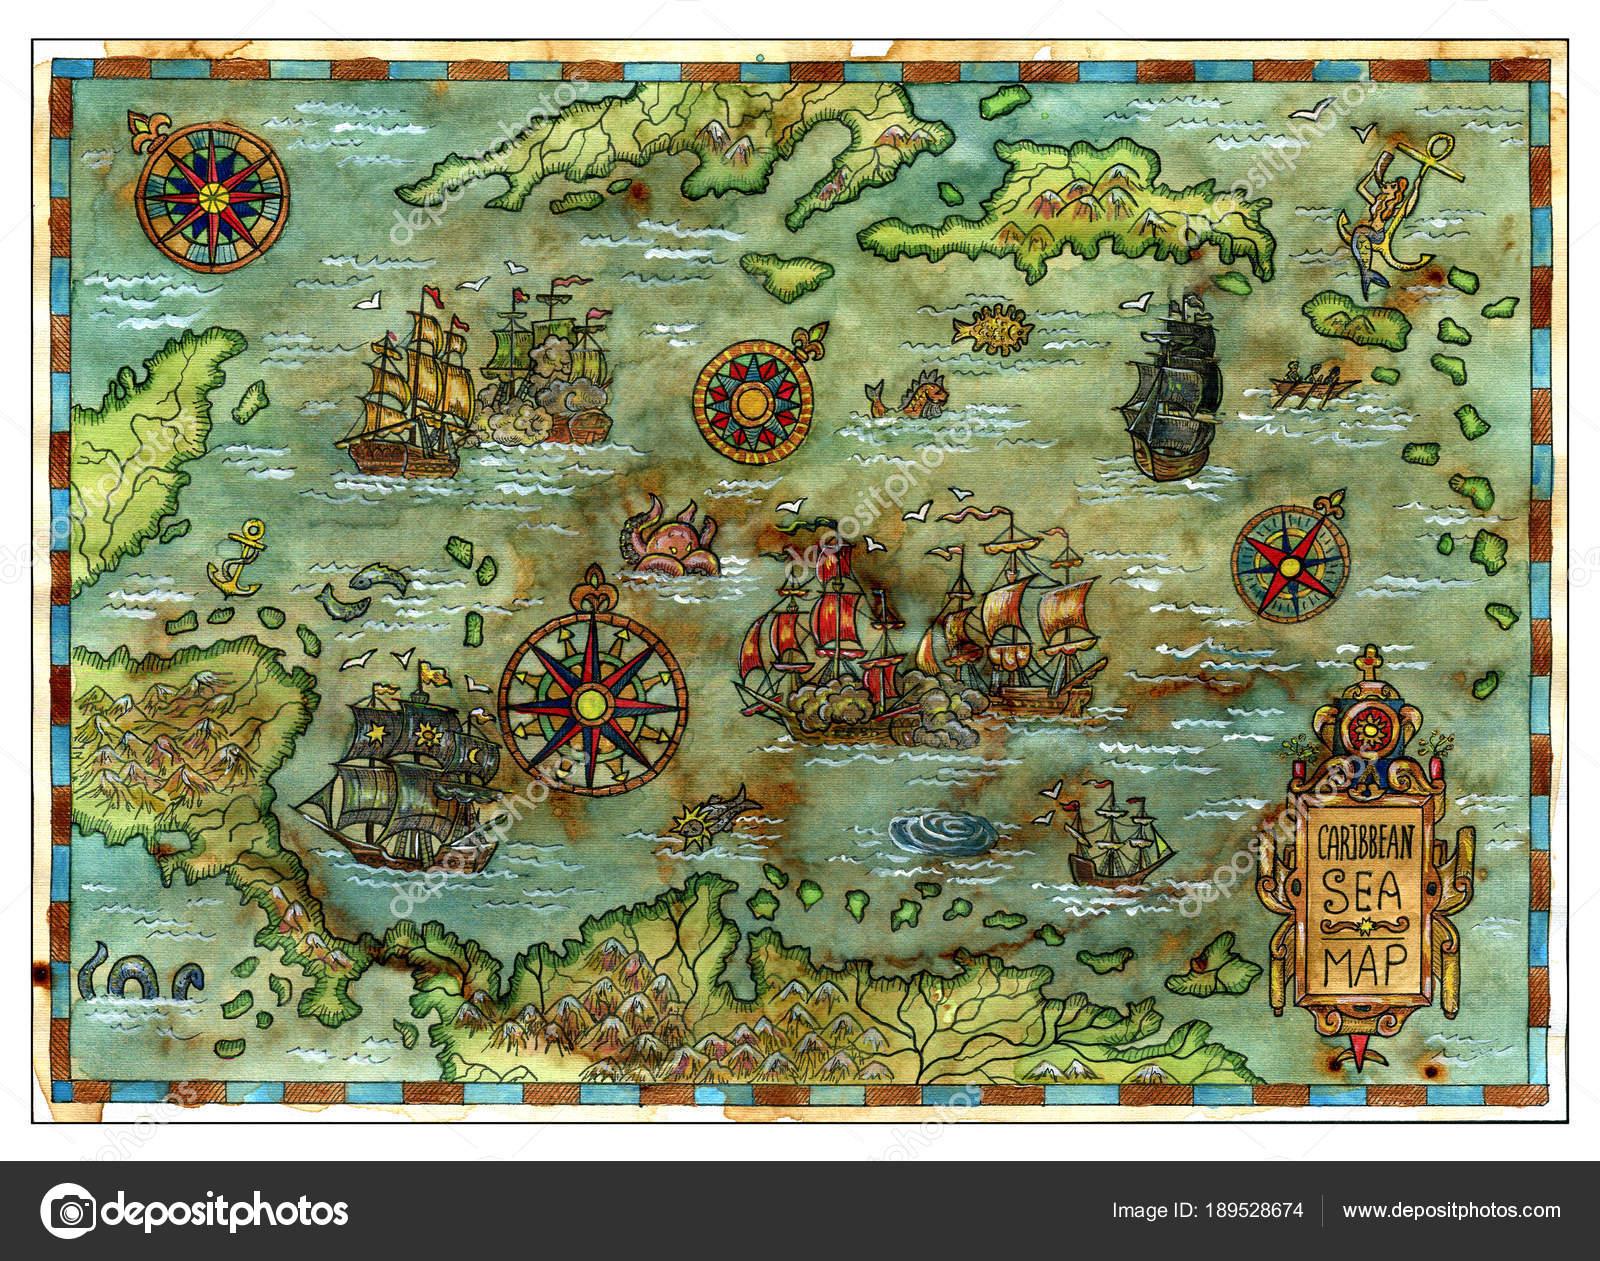 Ancient Caribbean Sea Map Pirate Ships Islands Decorative Antique ...